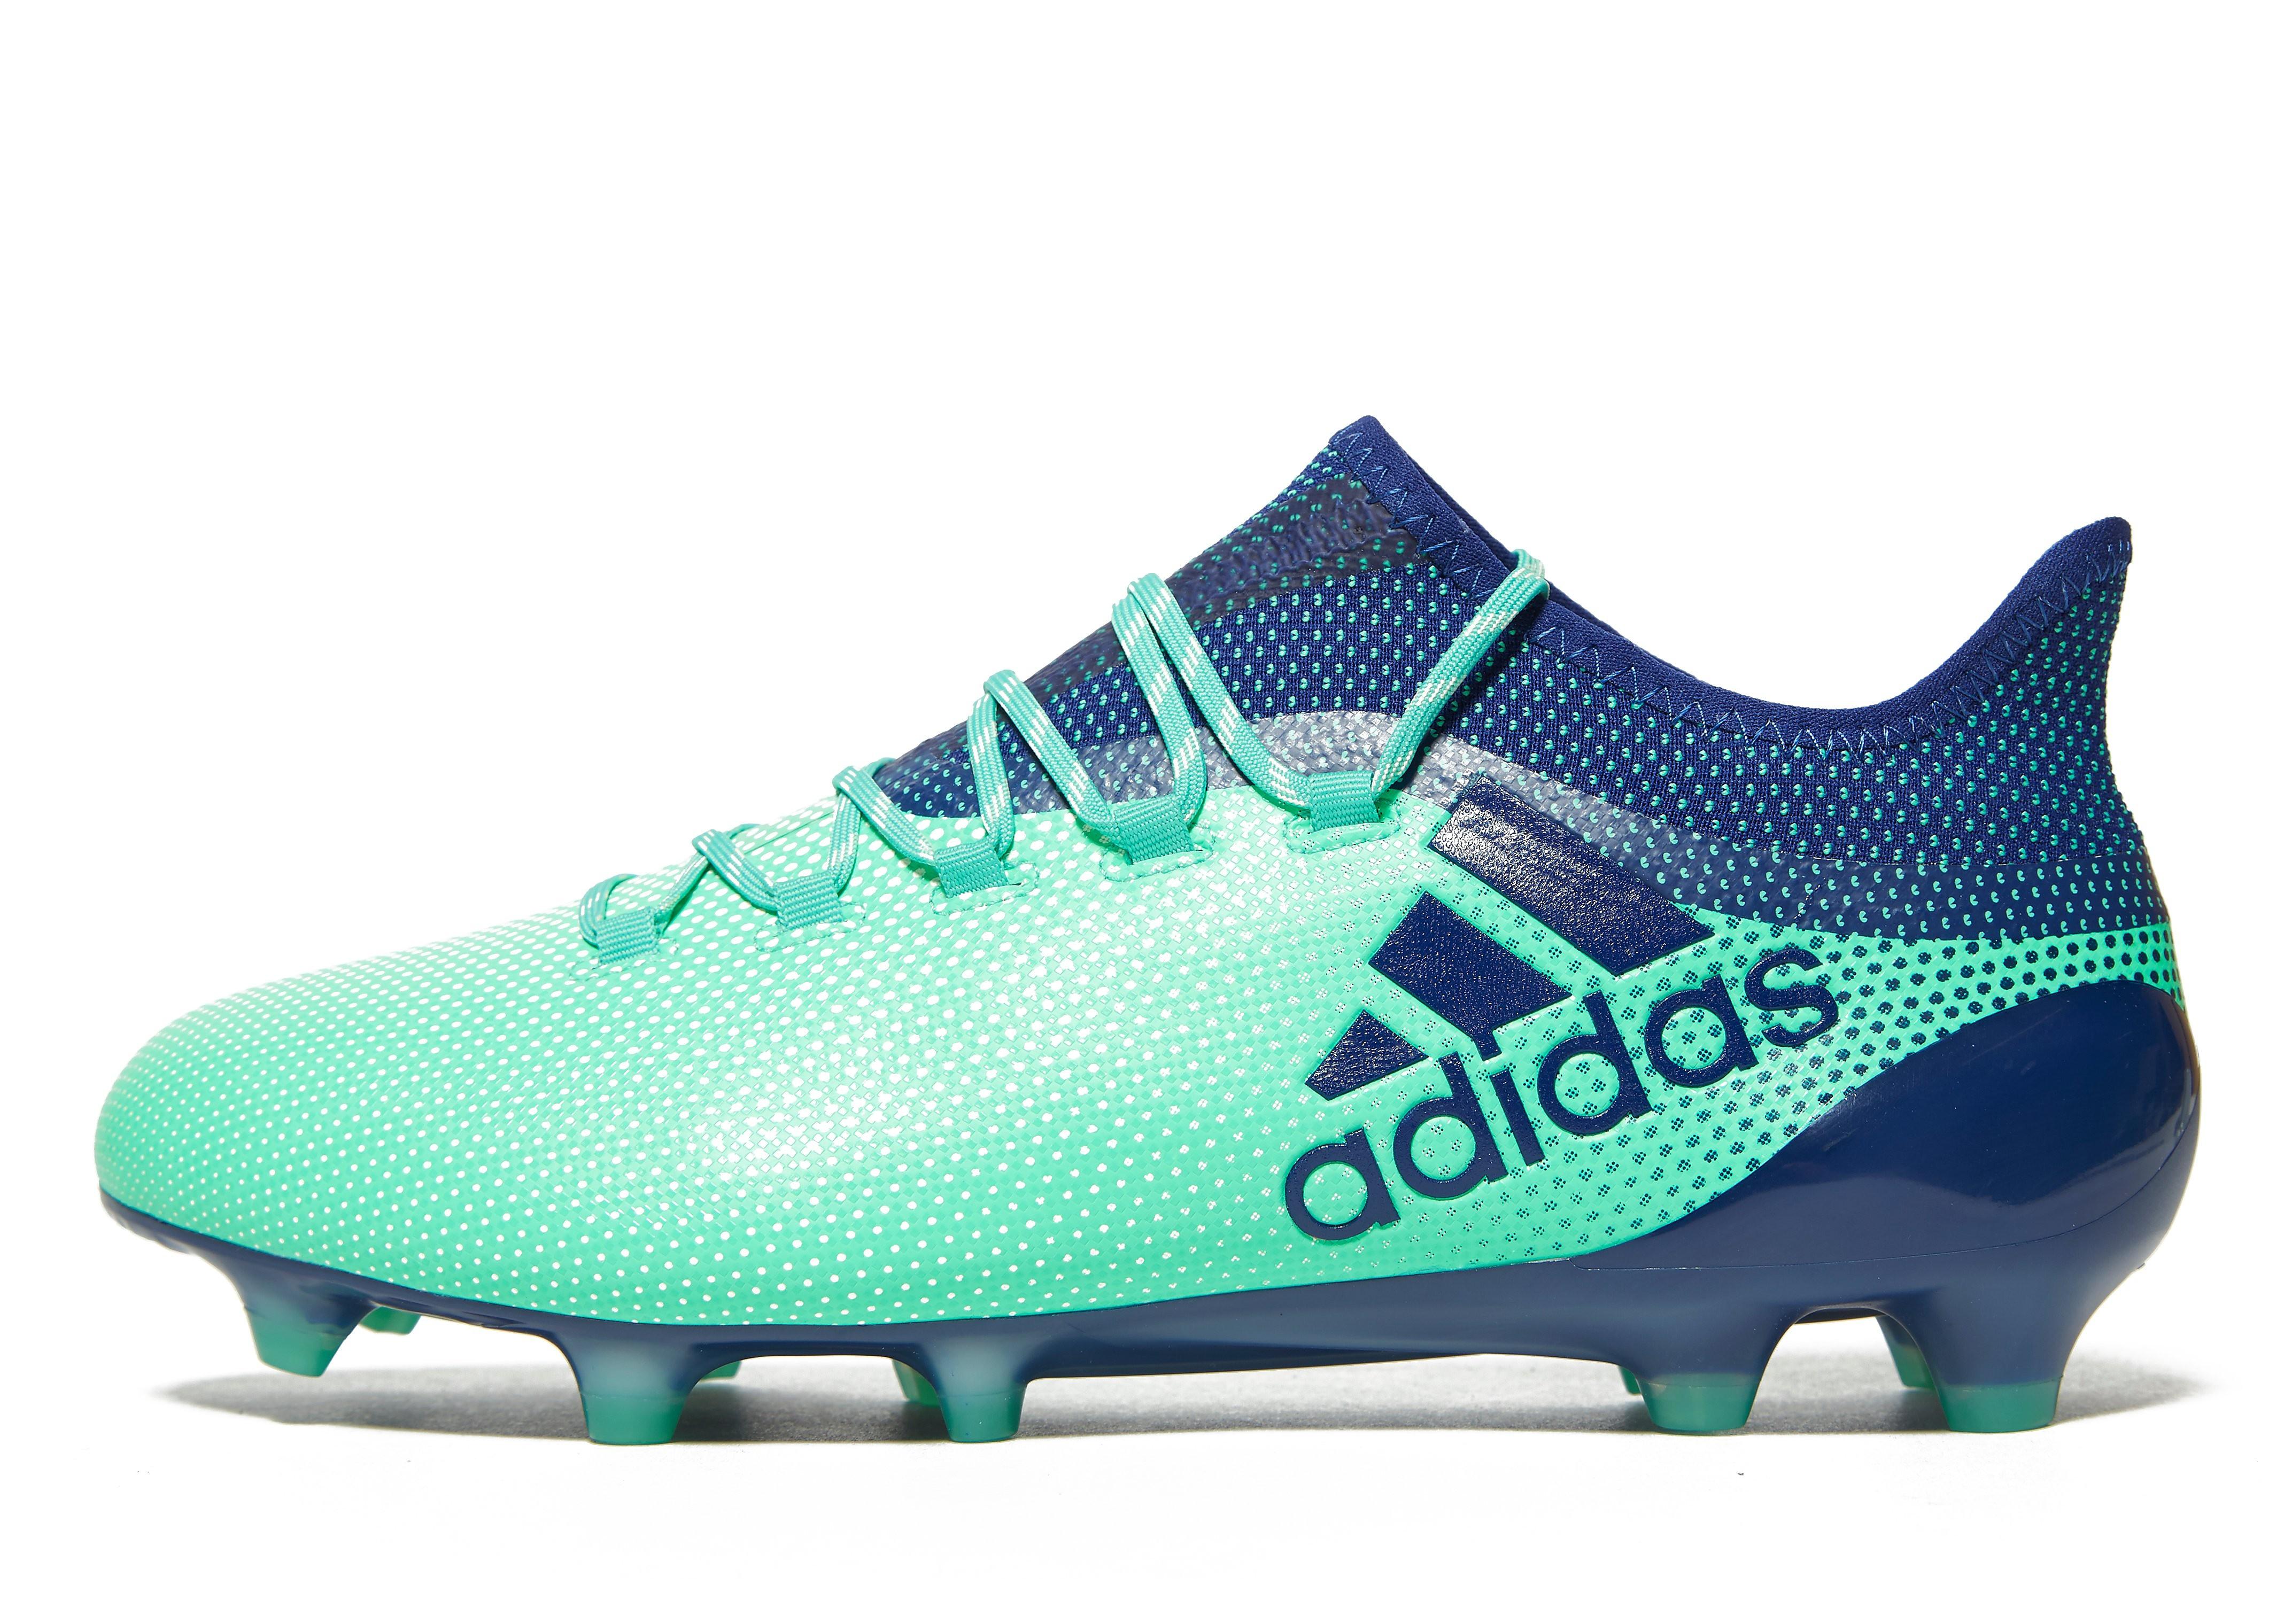 adidas Deadly Strike X 17.1 FG PRE ORDER